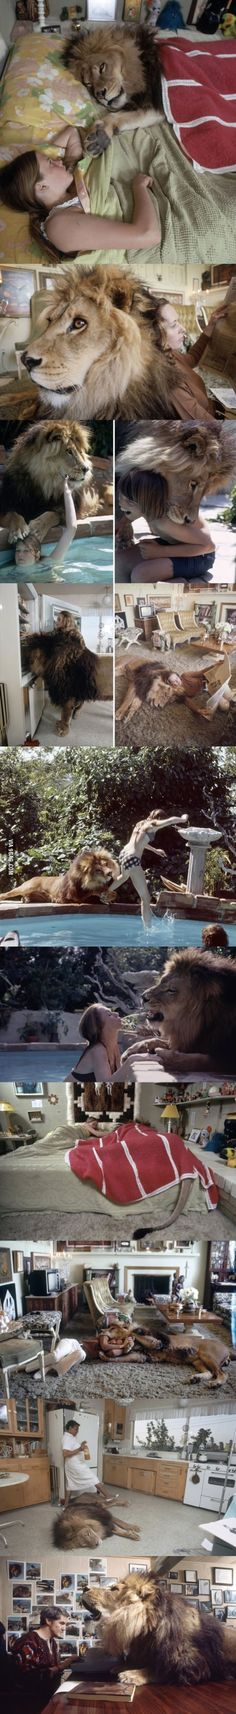 Gotta love it when your best friend is a lion